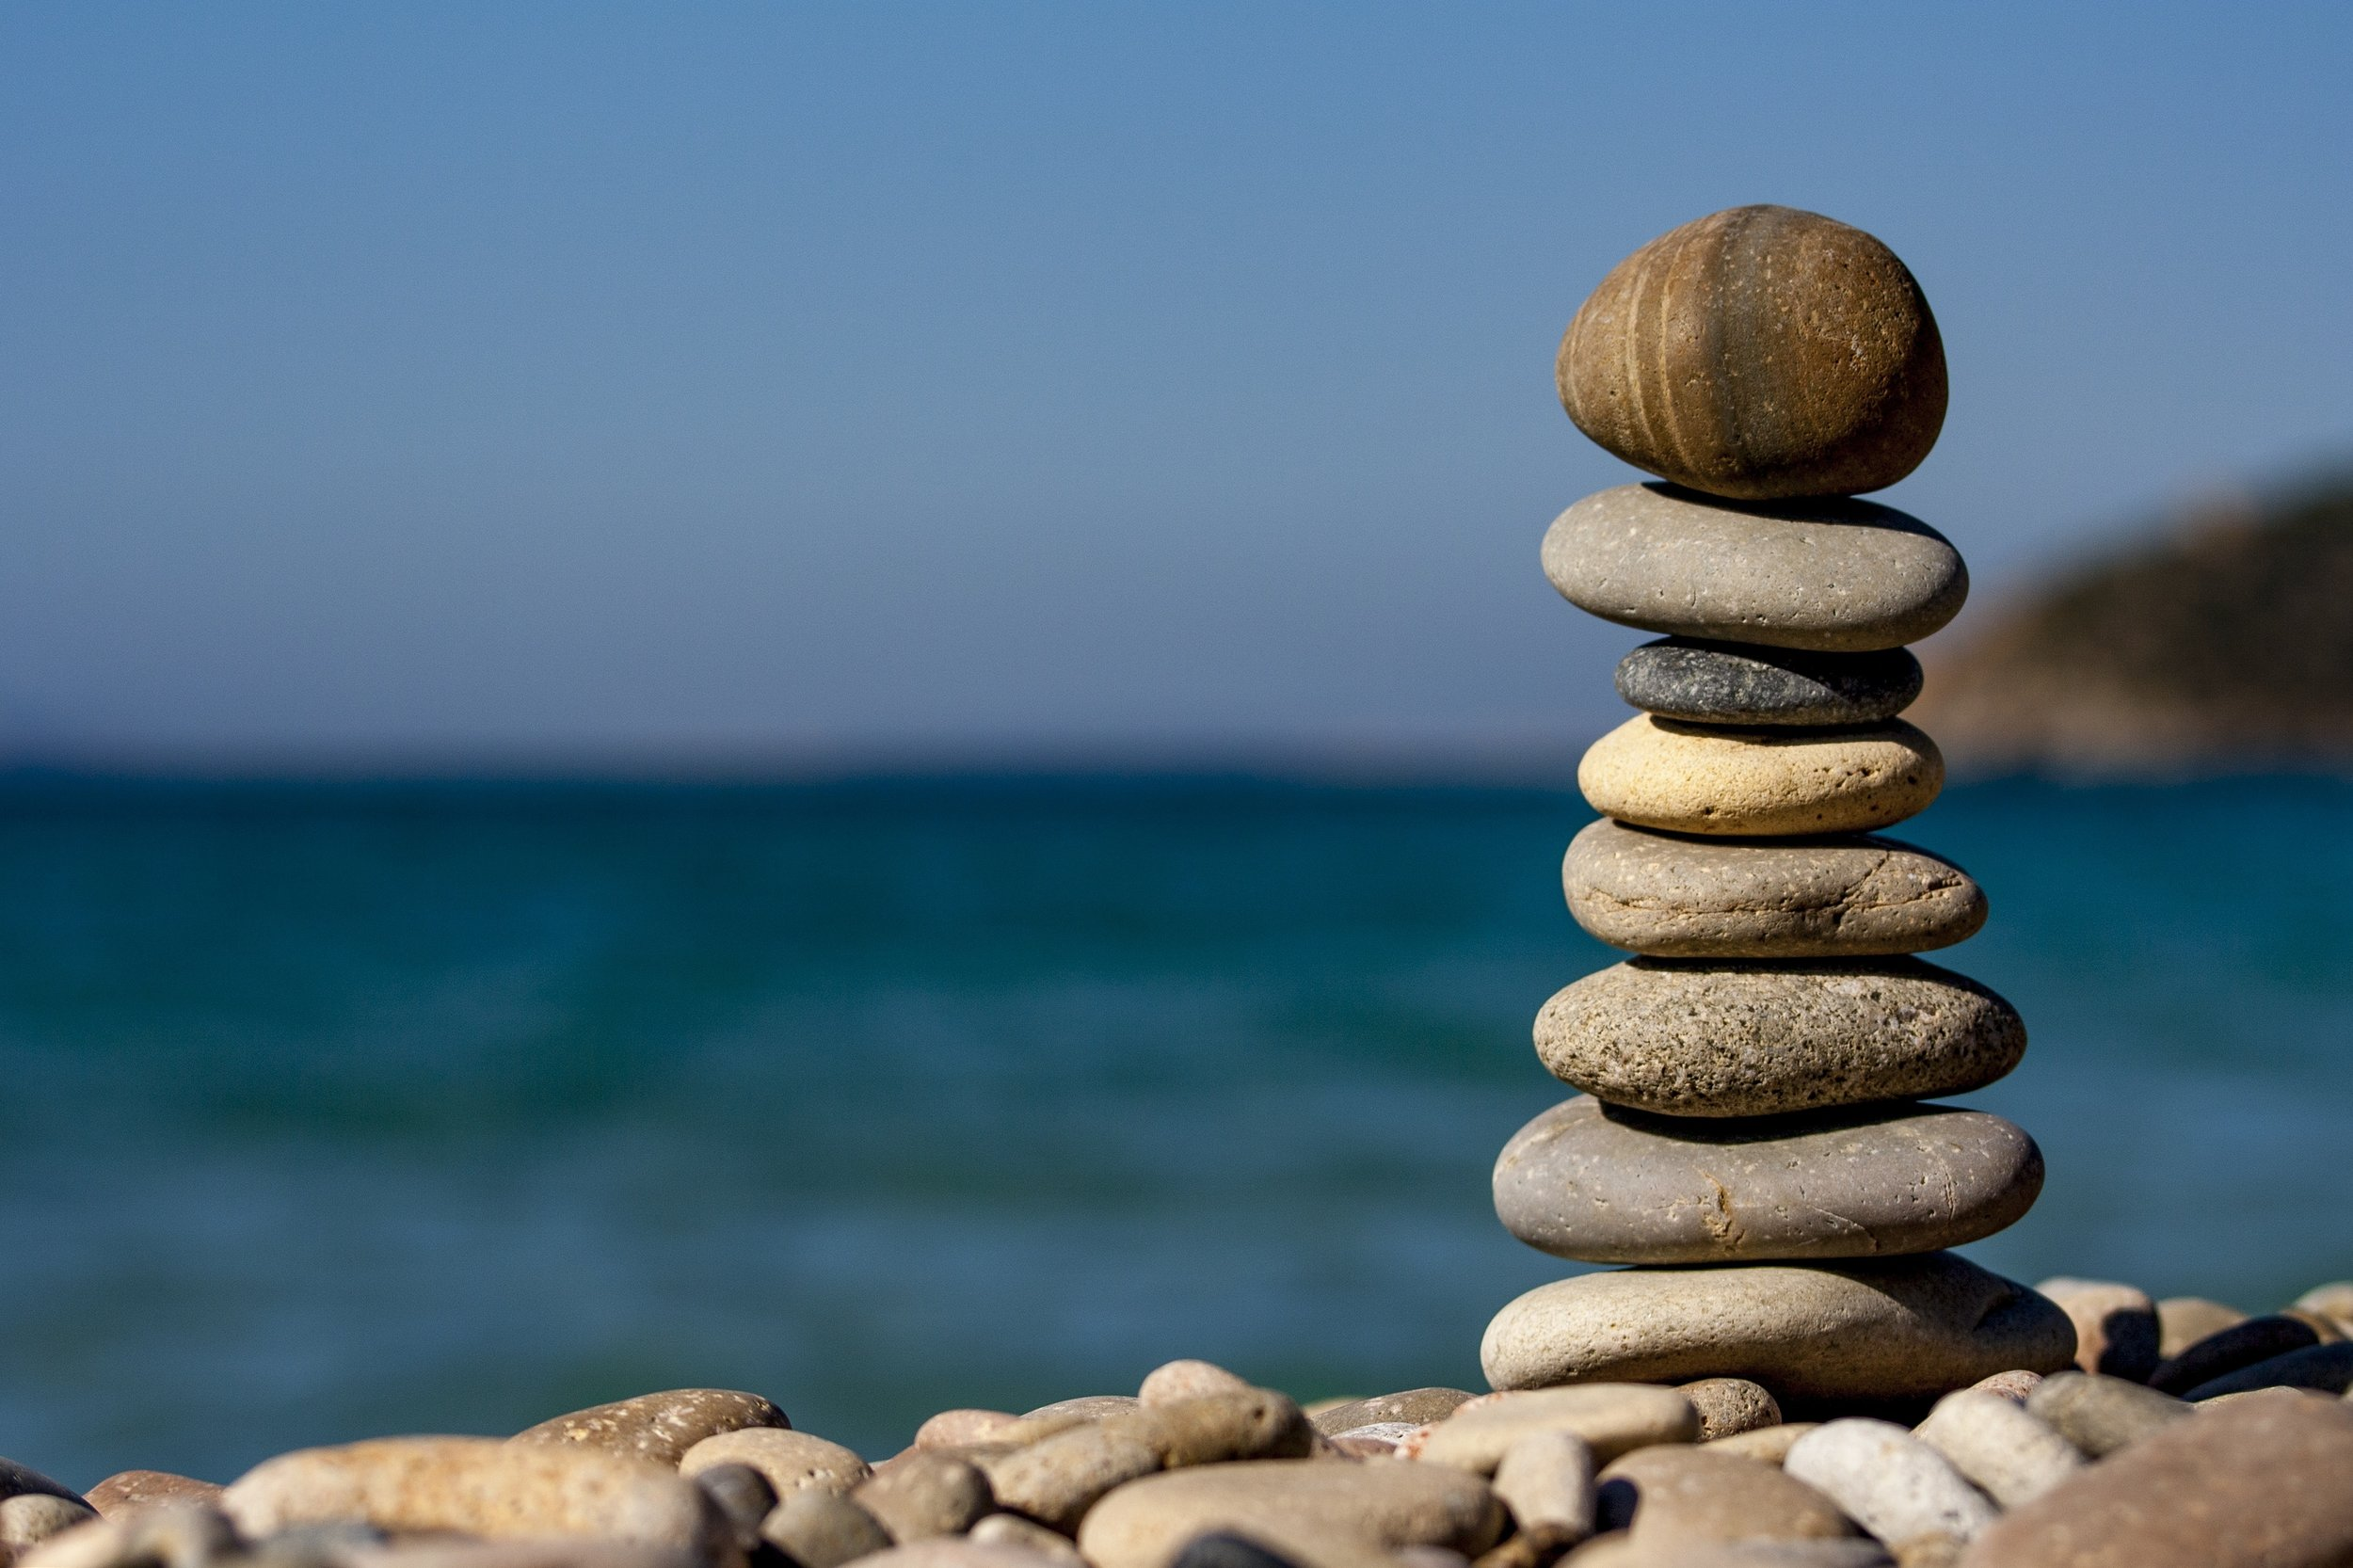 Balancing Rocks.jpeg